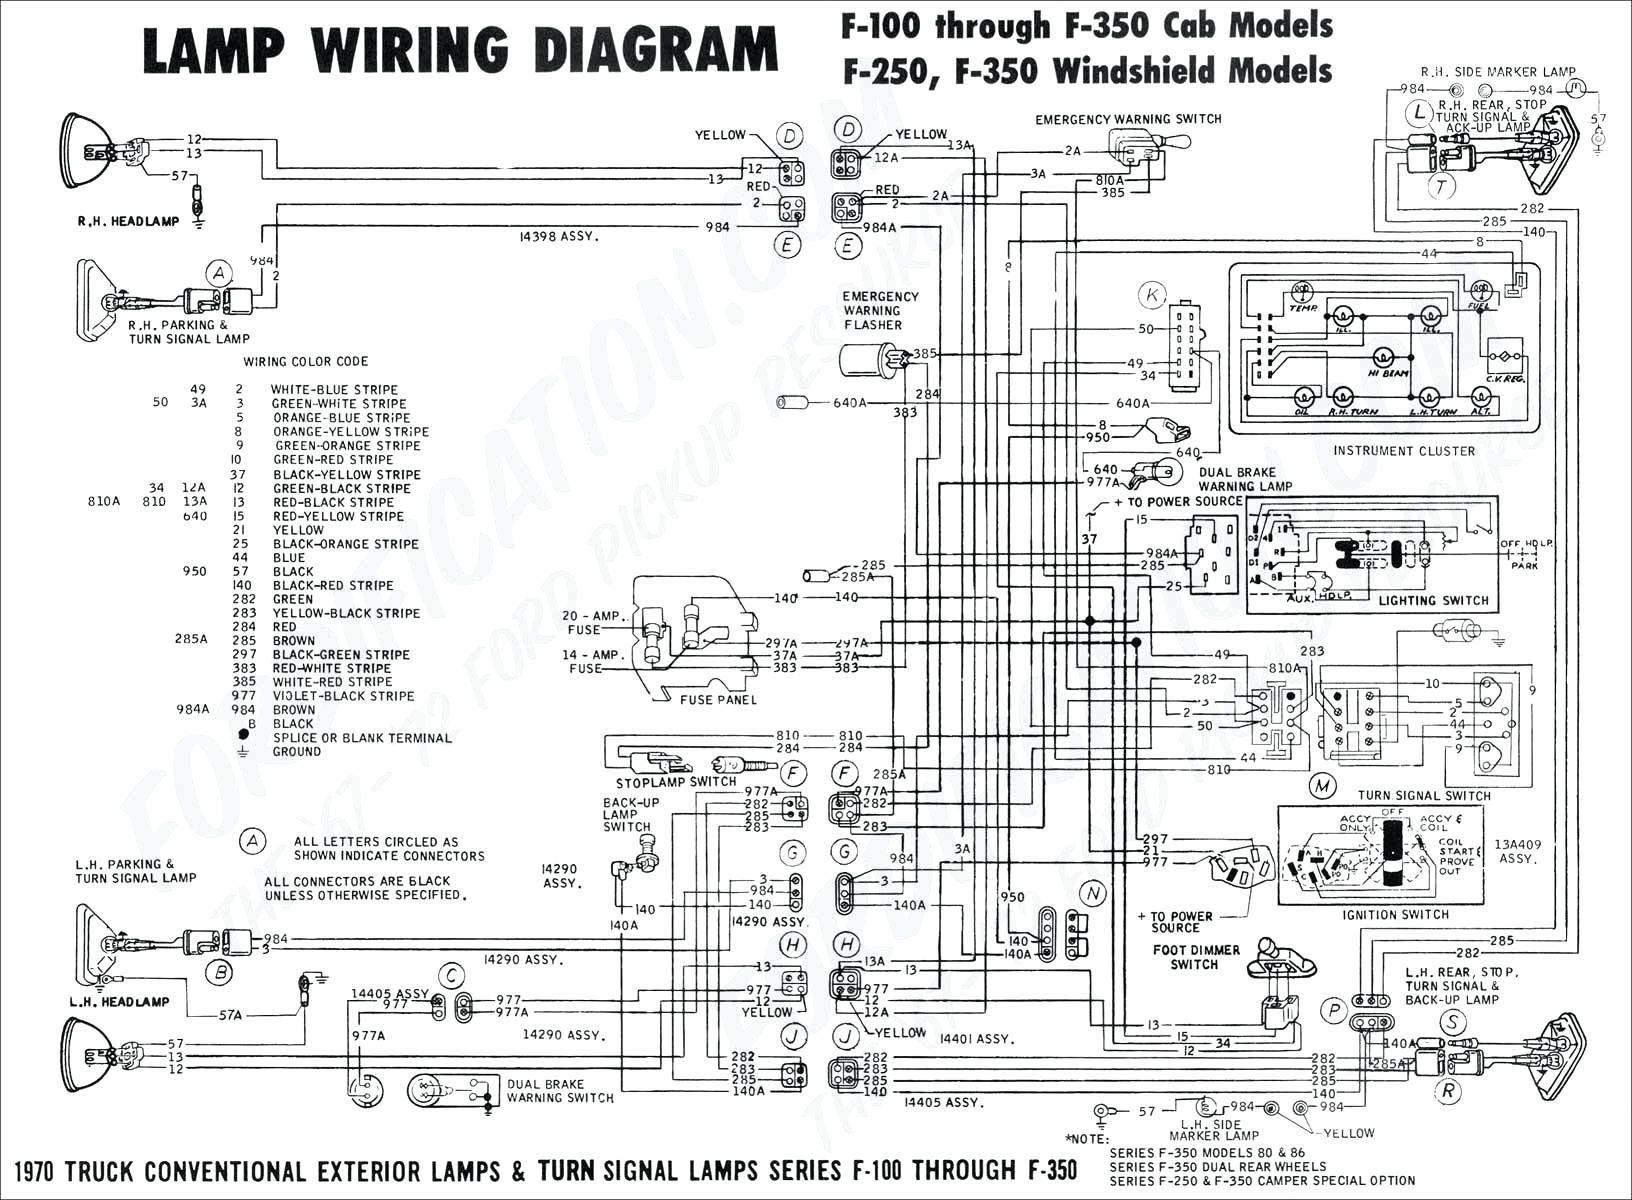 1996 ford Explorer Engine Diagram ford Explorer Relay Diagram – Simple Wiring Diagram Of 1996 ford Explorer Engine Diagram